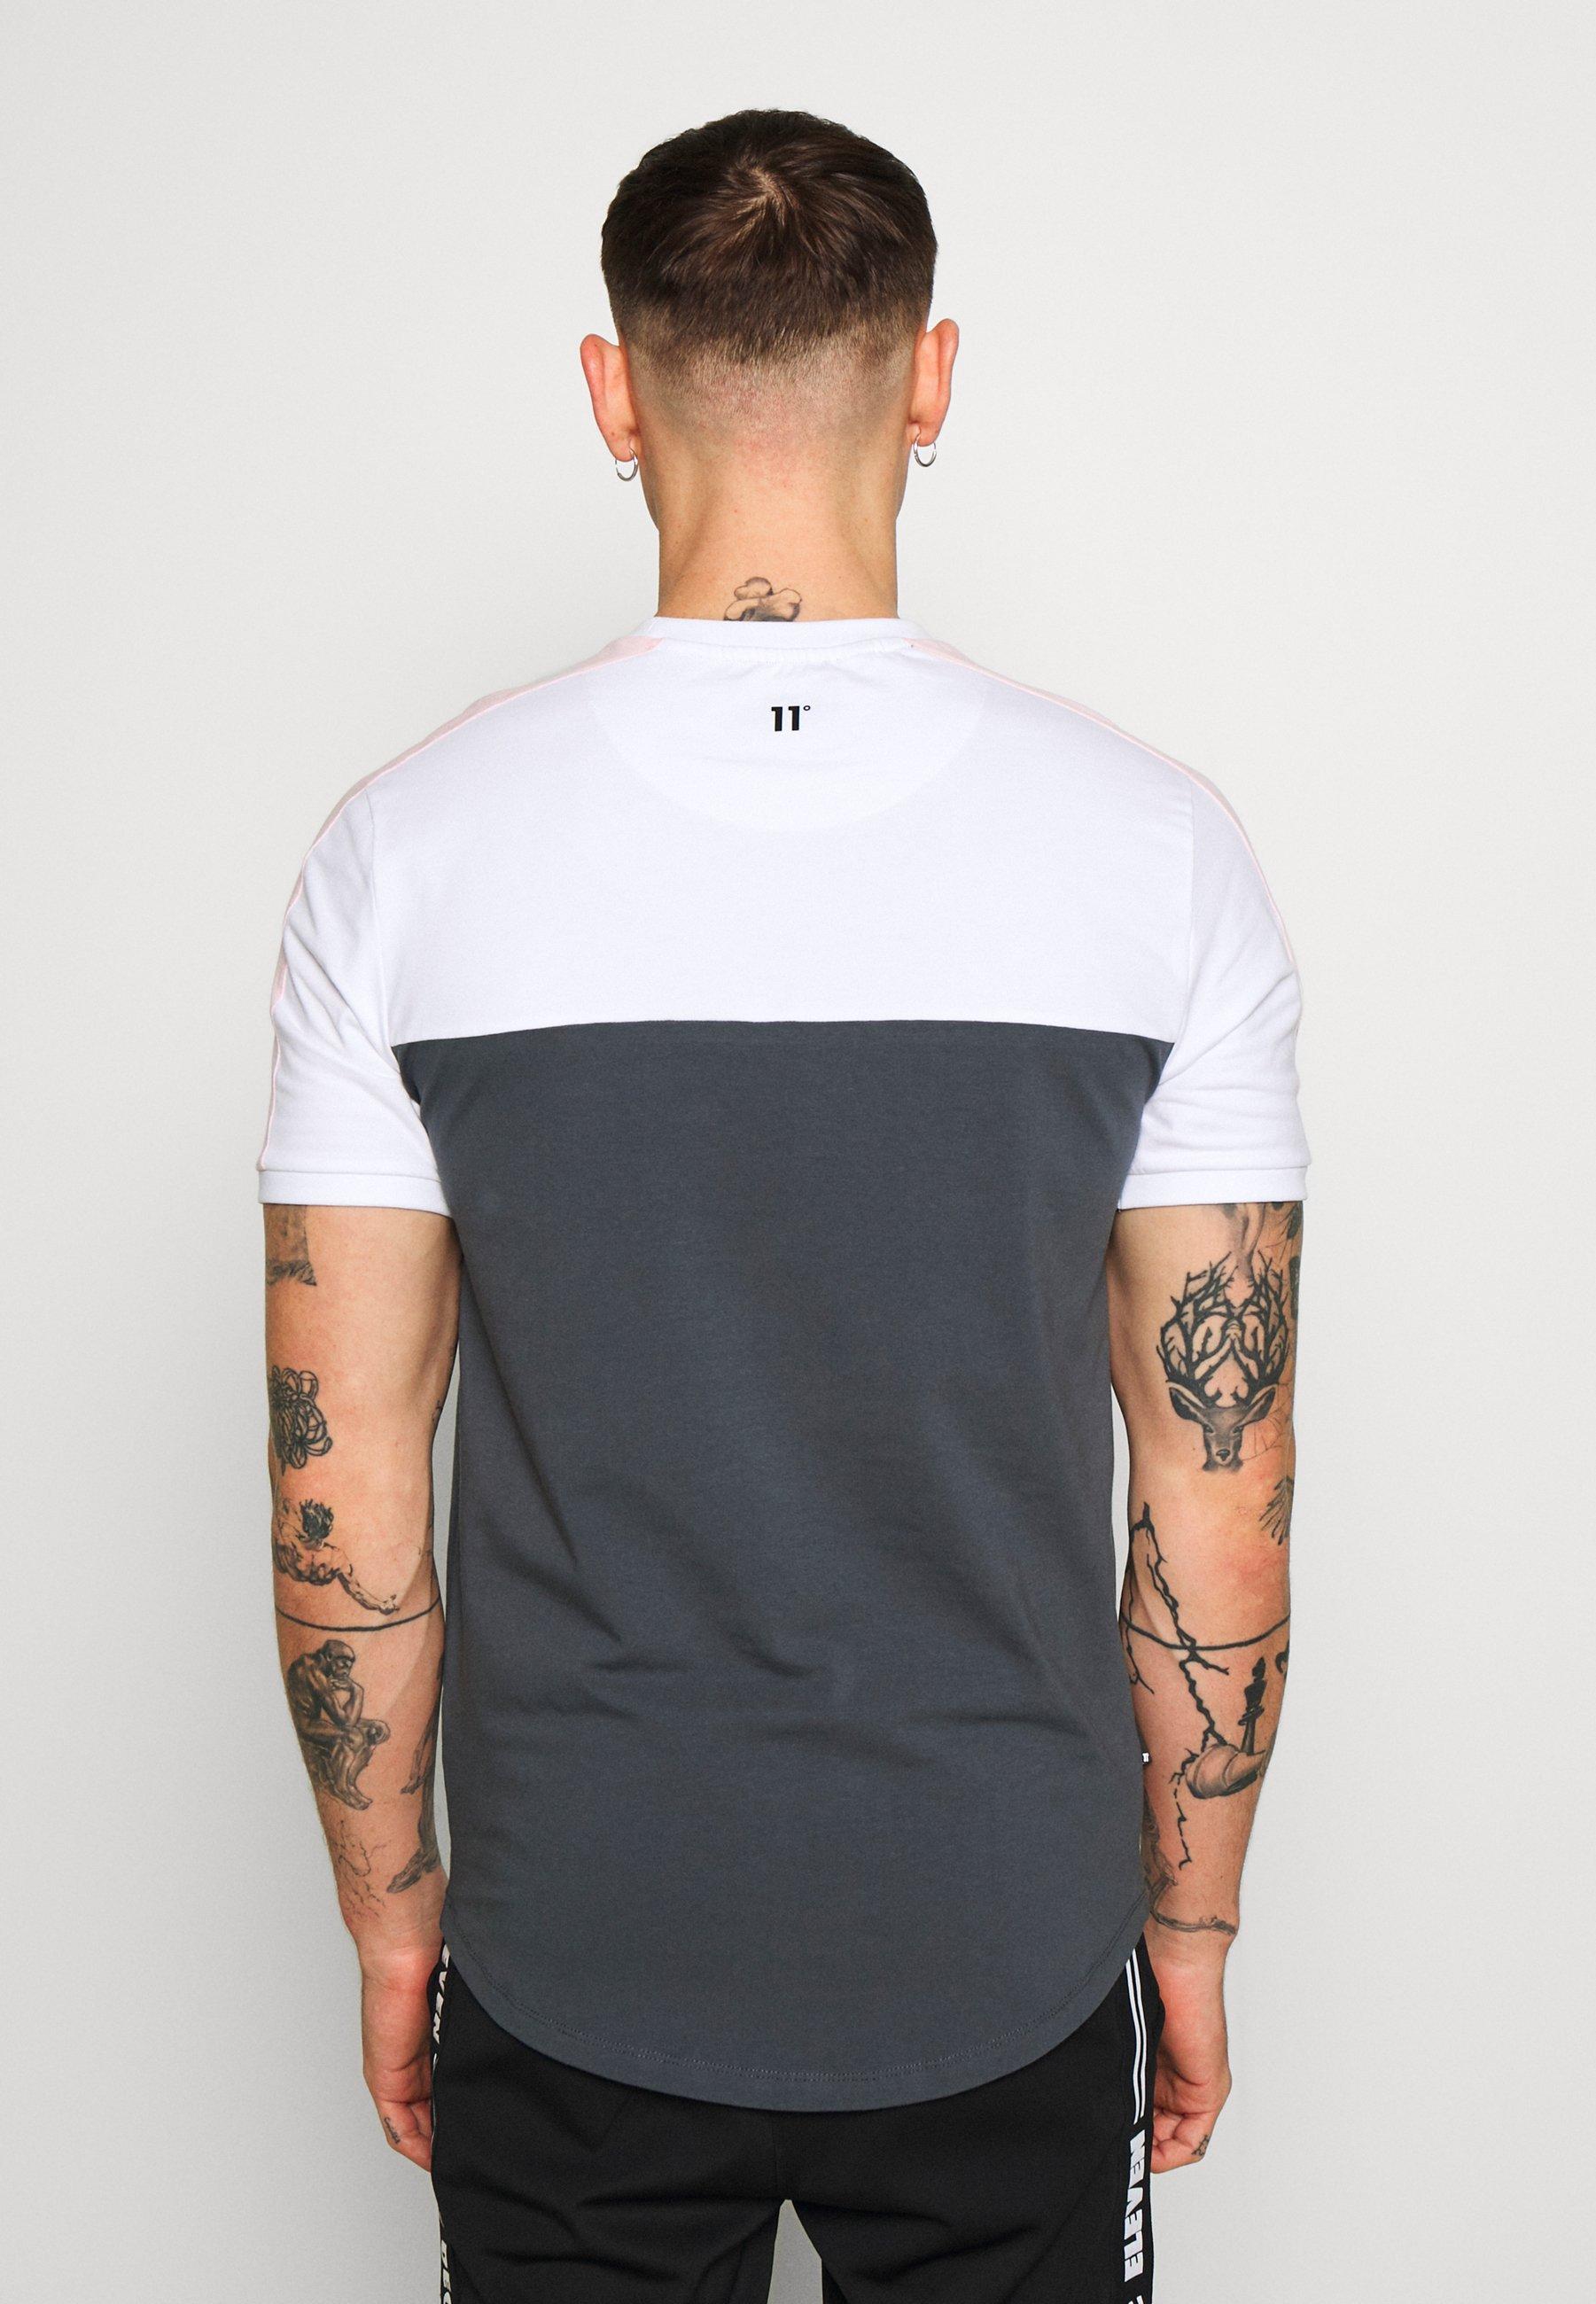 11 Degrees Panel Block - T-shirt Imprimé Anthracite/white/powder Pink